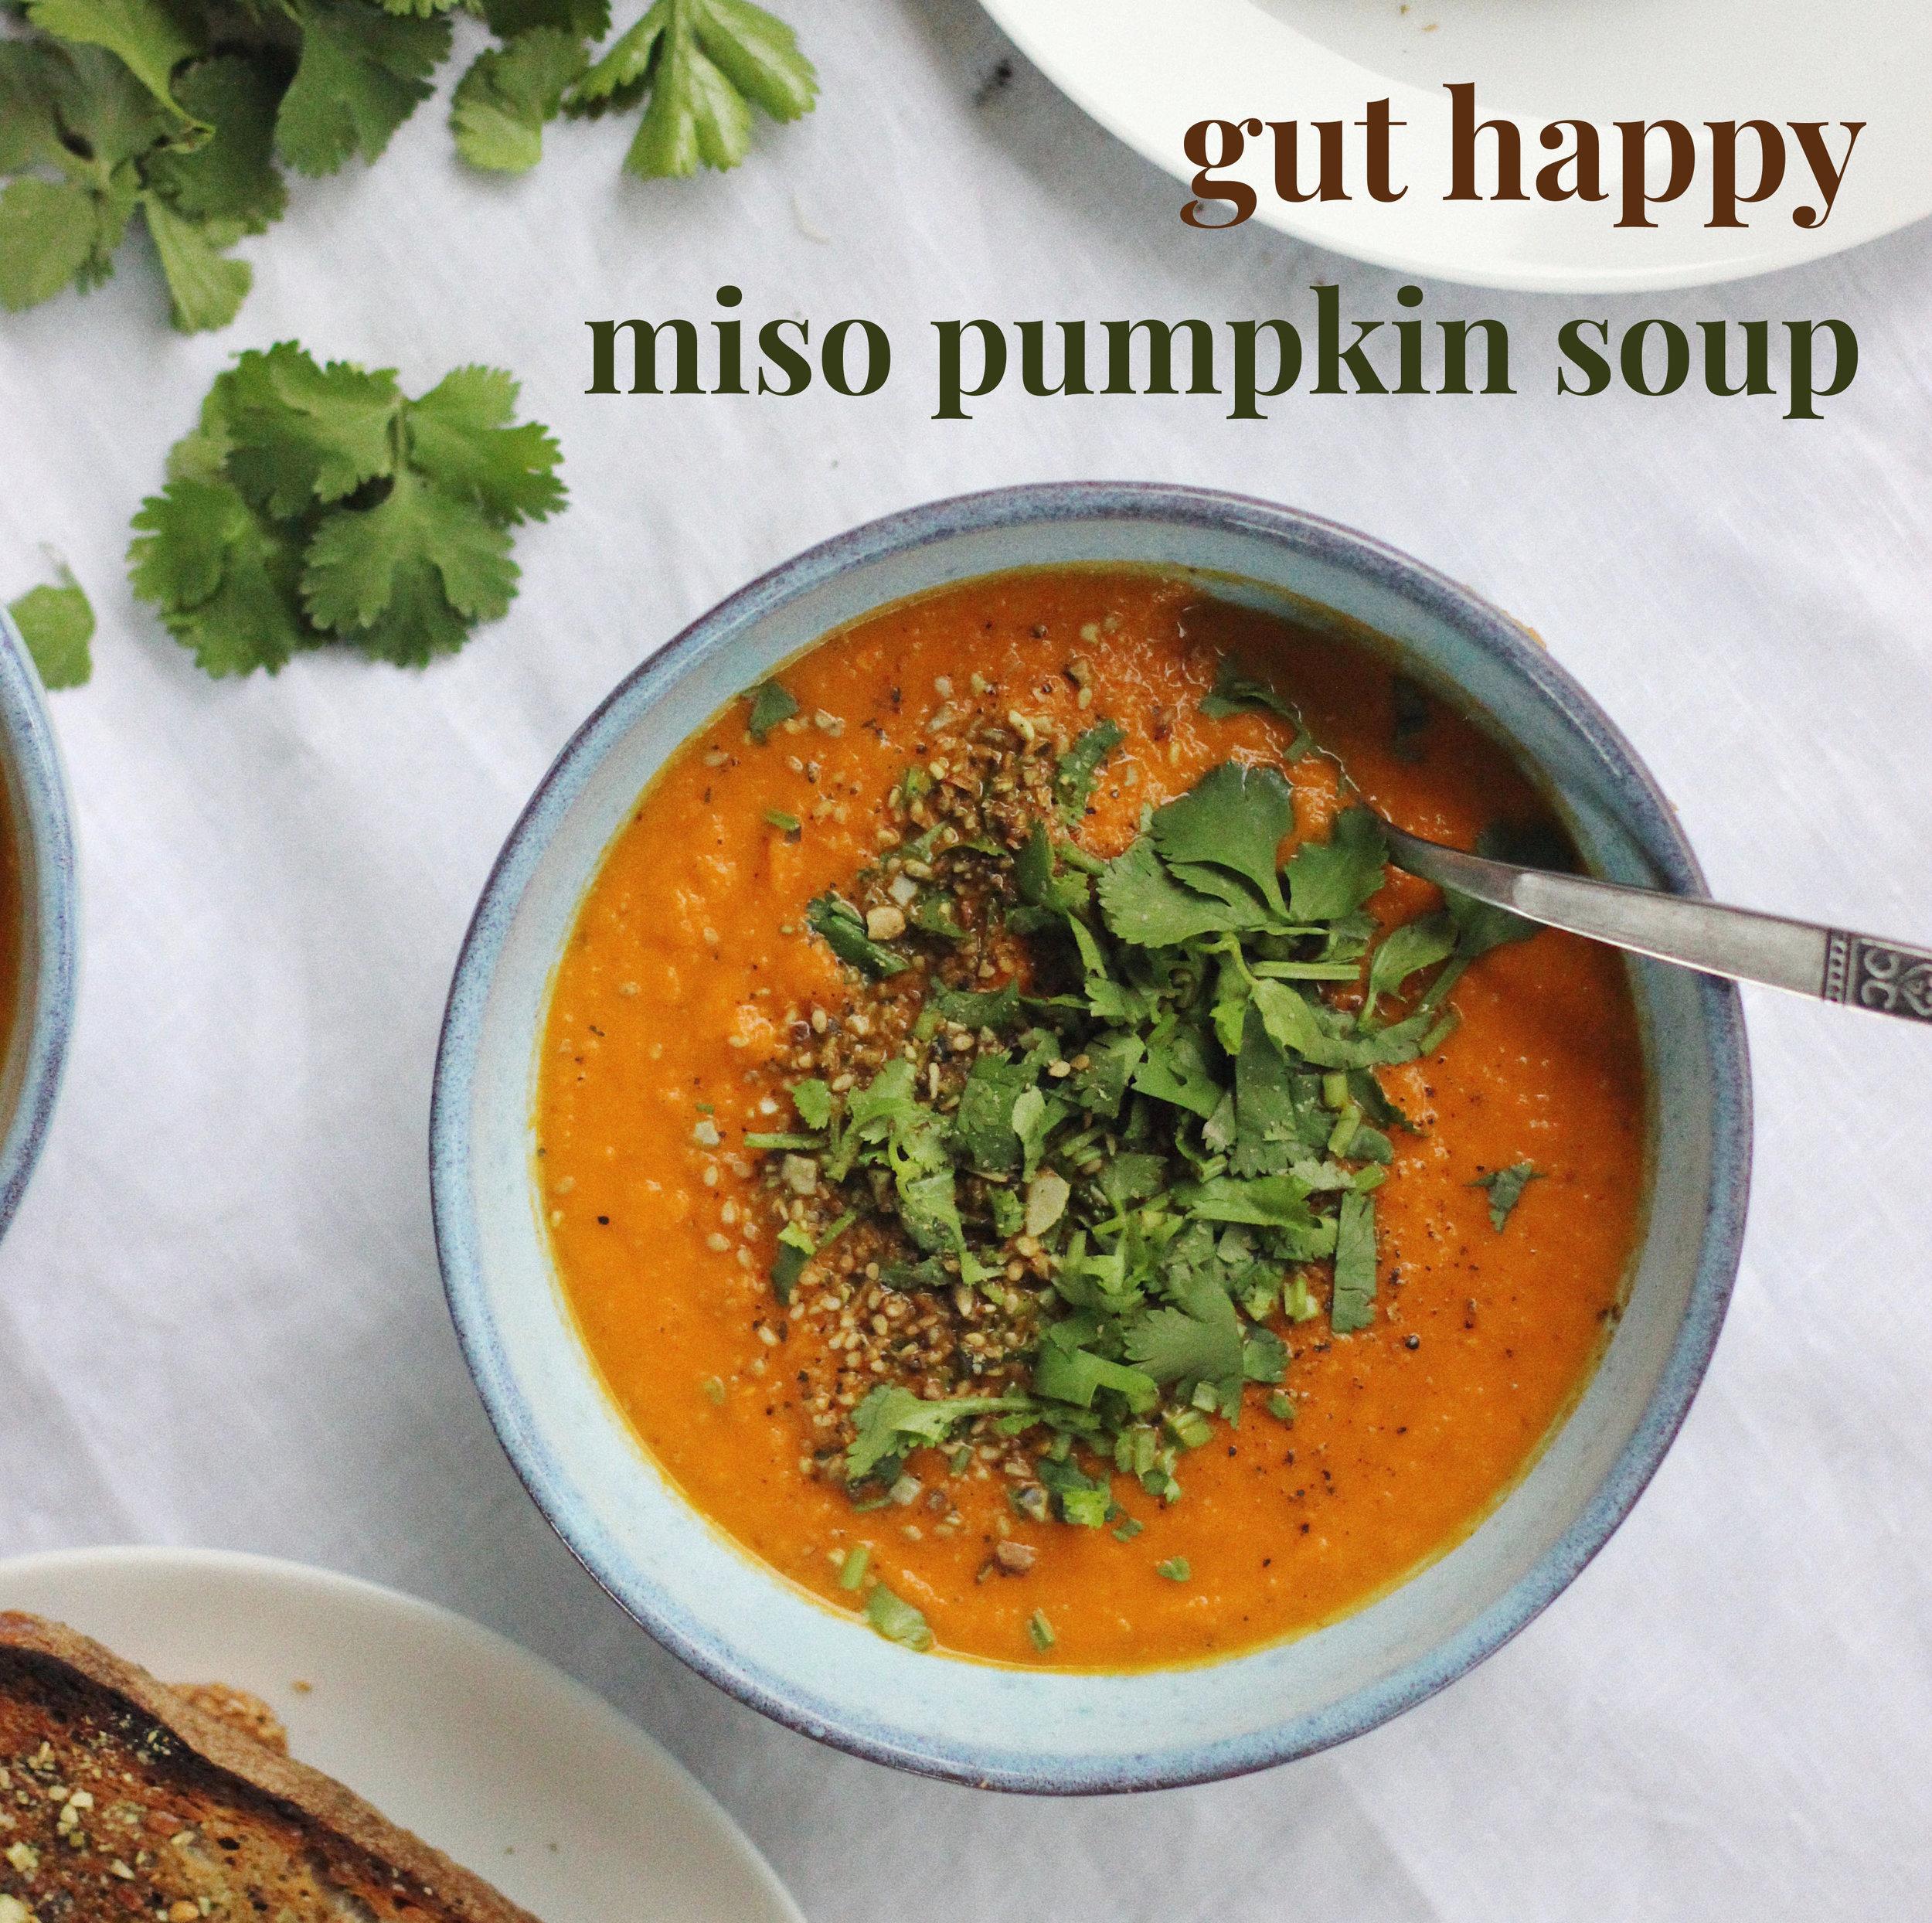 miso pumpkin soup .jpg